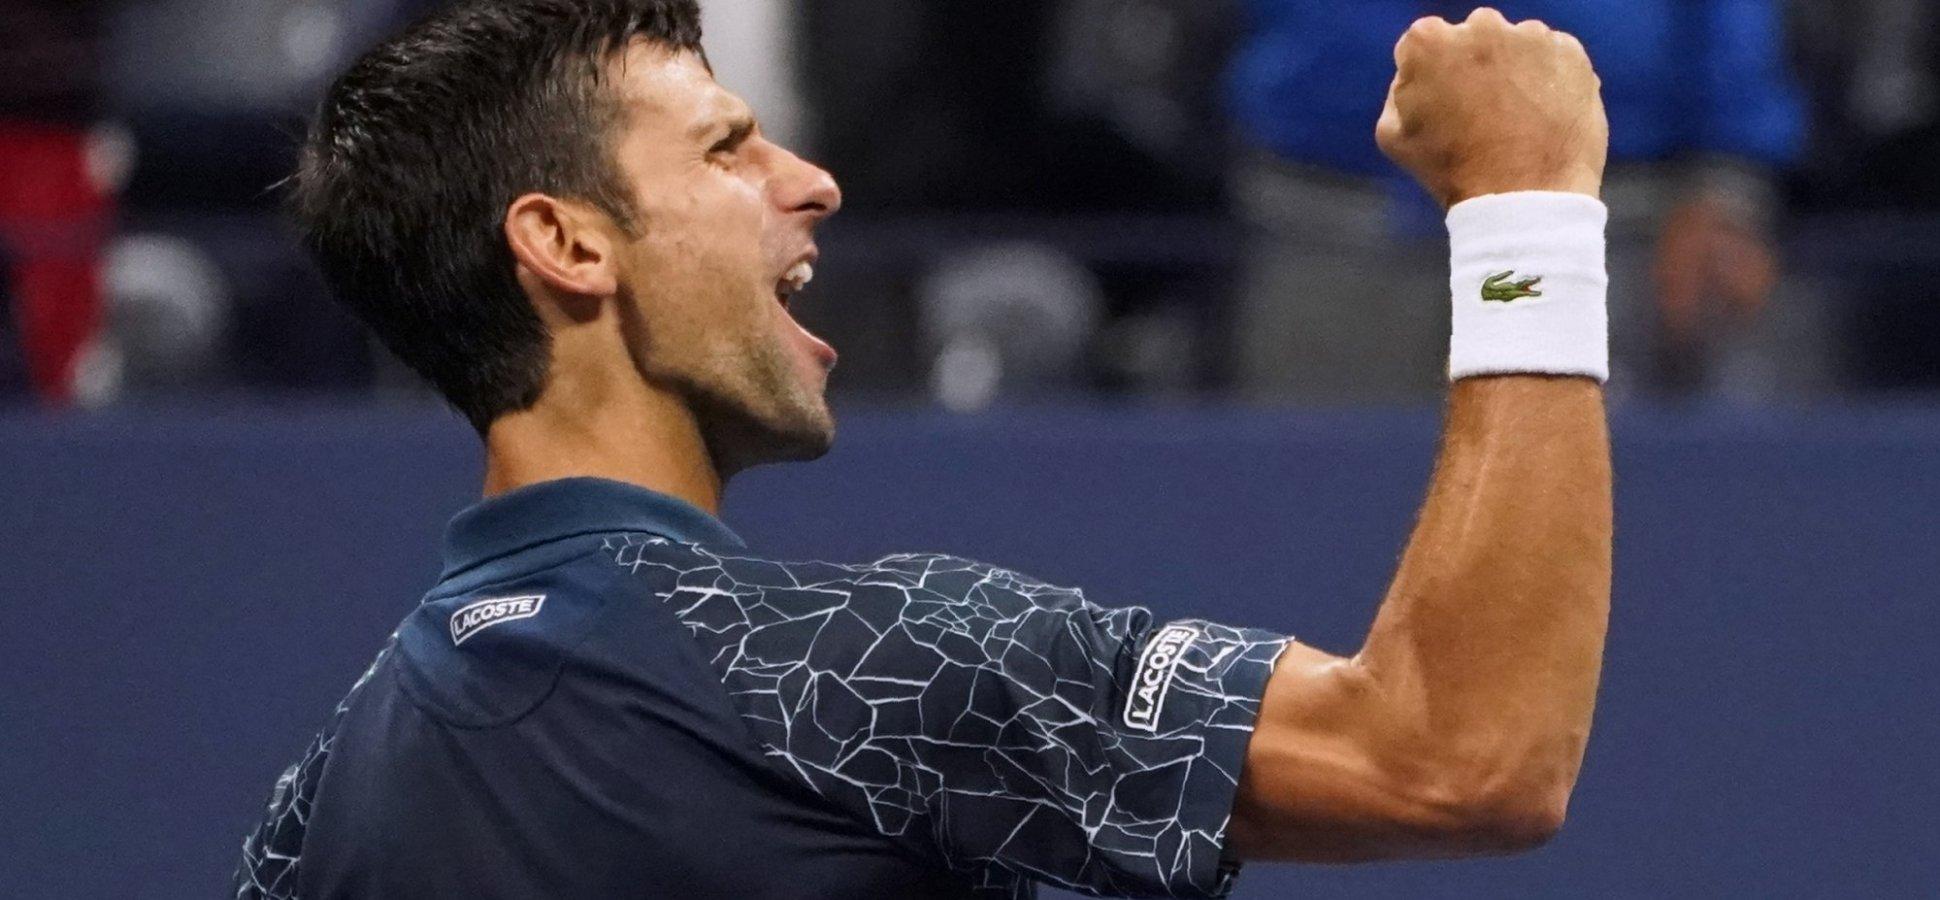 Steal Novak Djokovic's Secret for Breaking Out of a Career Rut